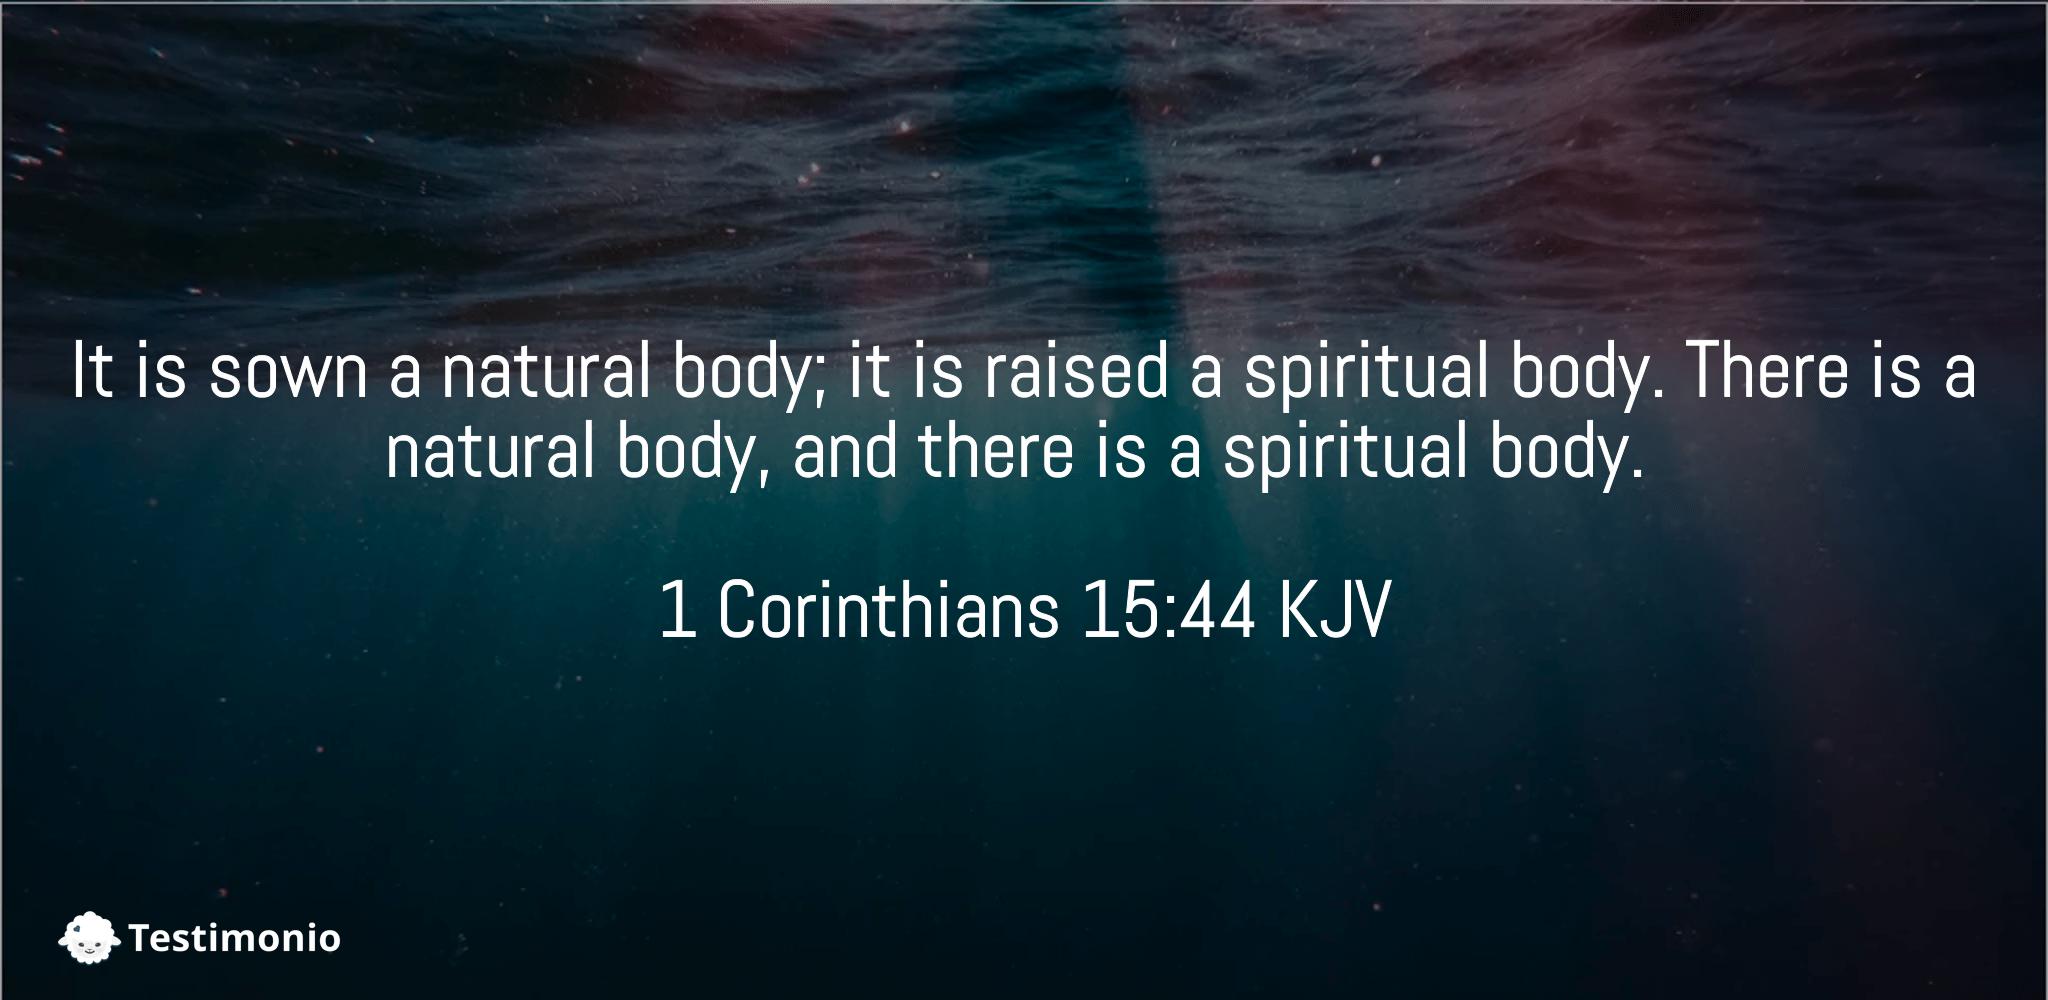 1 Corinthians 15:44